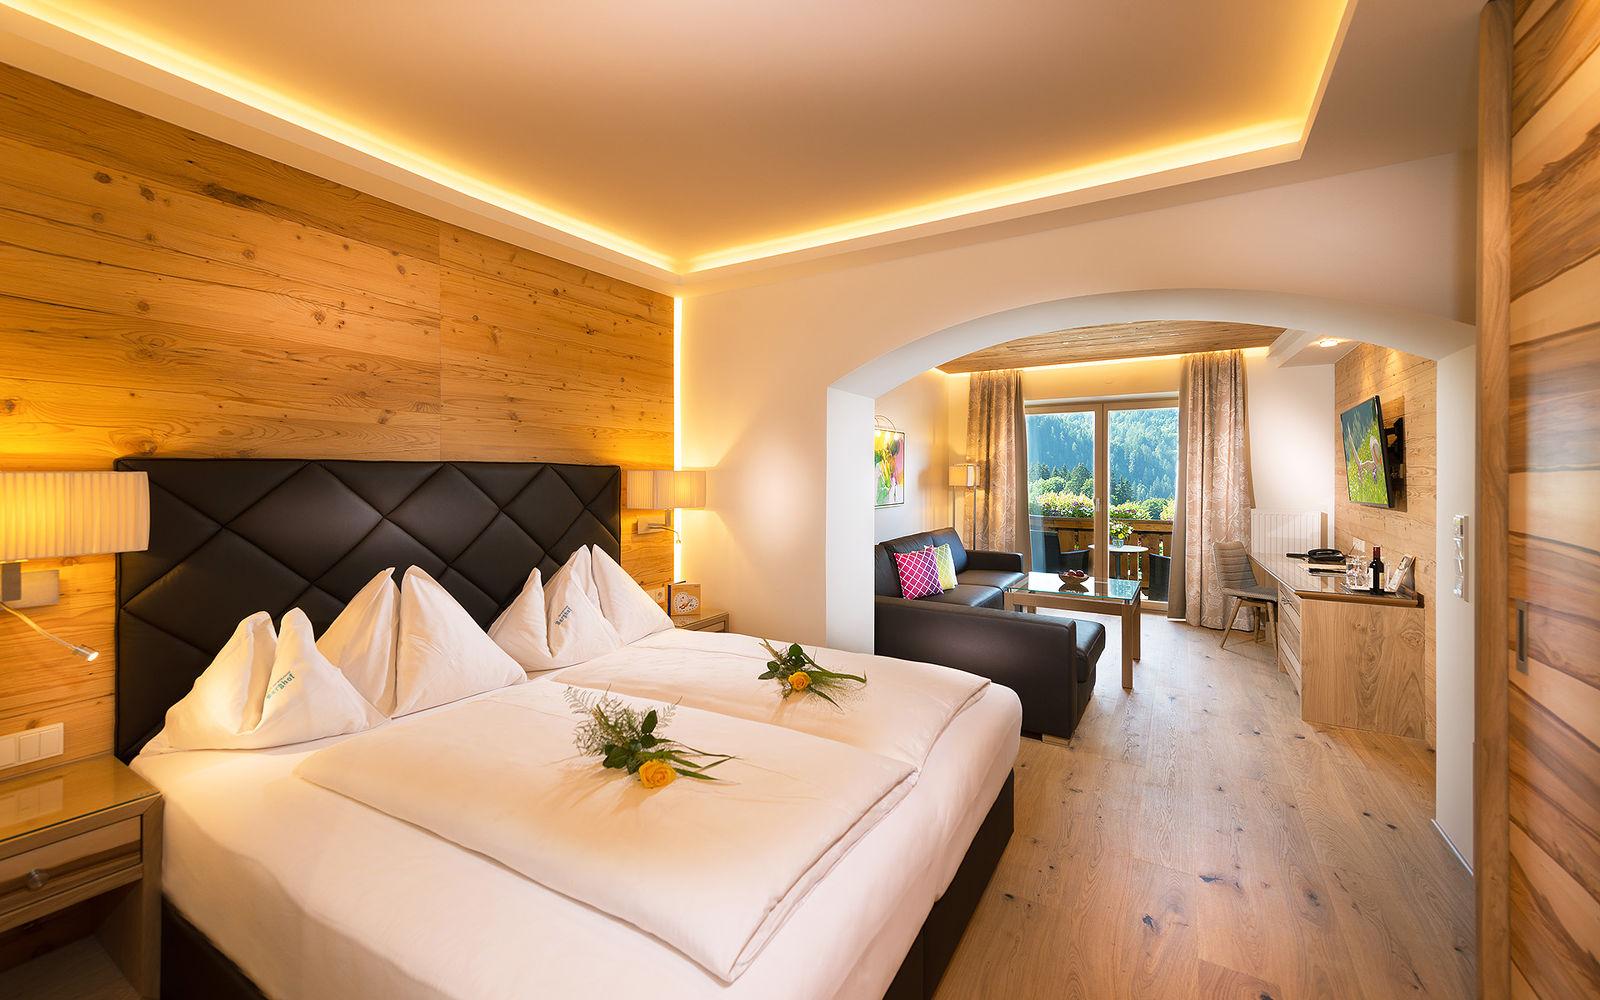 Verw hnhotel berghof s in st johann im pongau ihr top for Warnemunde 5 sterne hotel